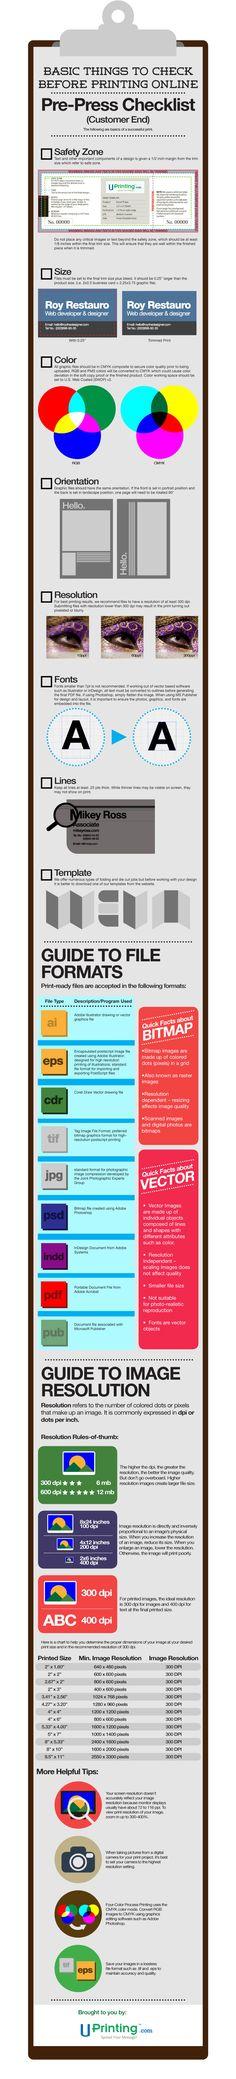 print_info